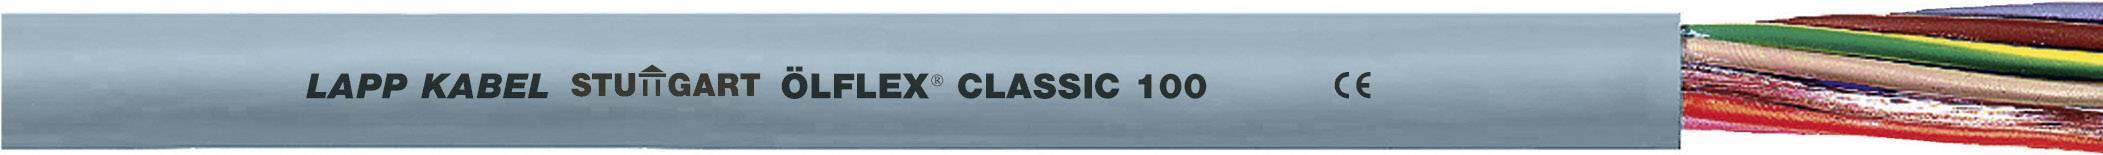 Kabel LappKabel Ölflex CLASSIC 100 3G16 (0010302), PVC, 18,3 mm, 750 V, šedá, 1000 m